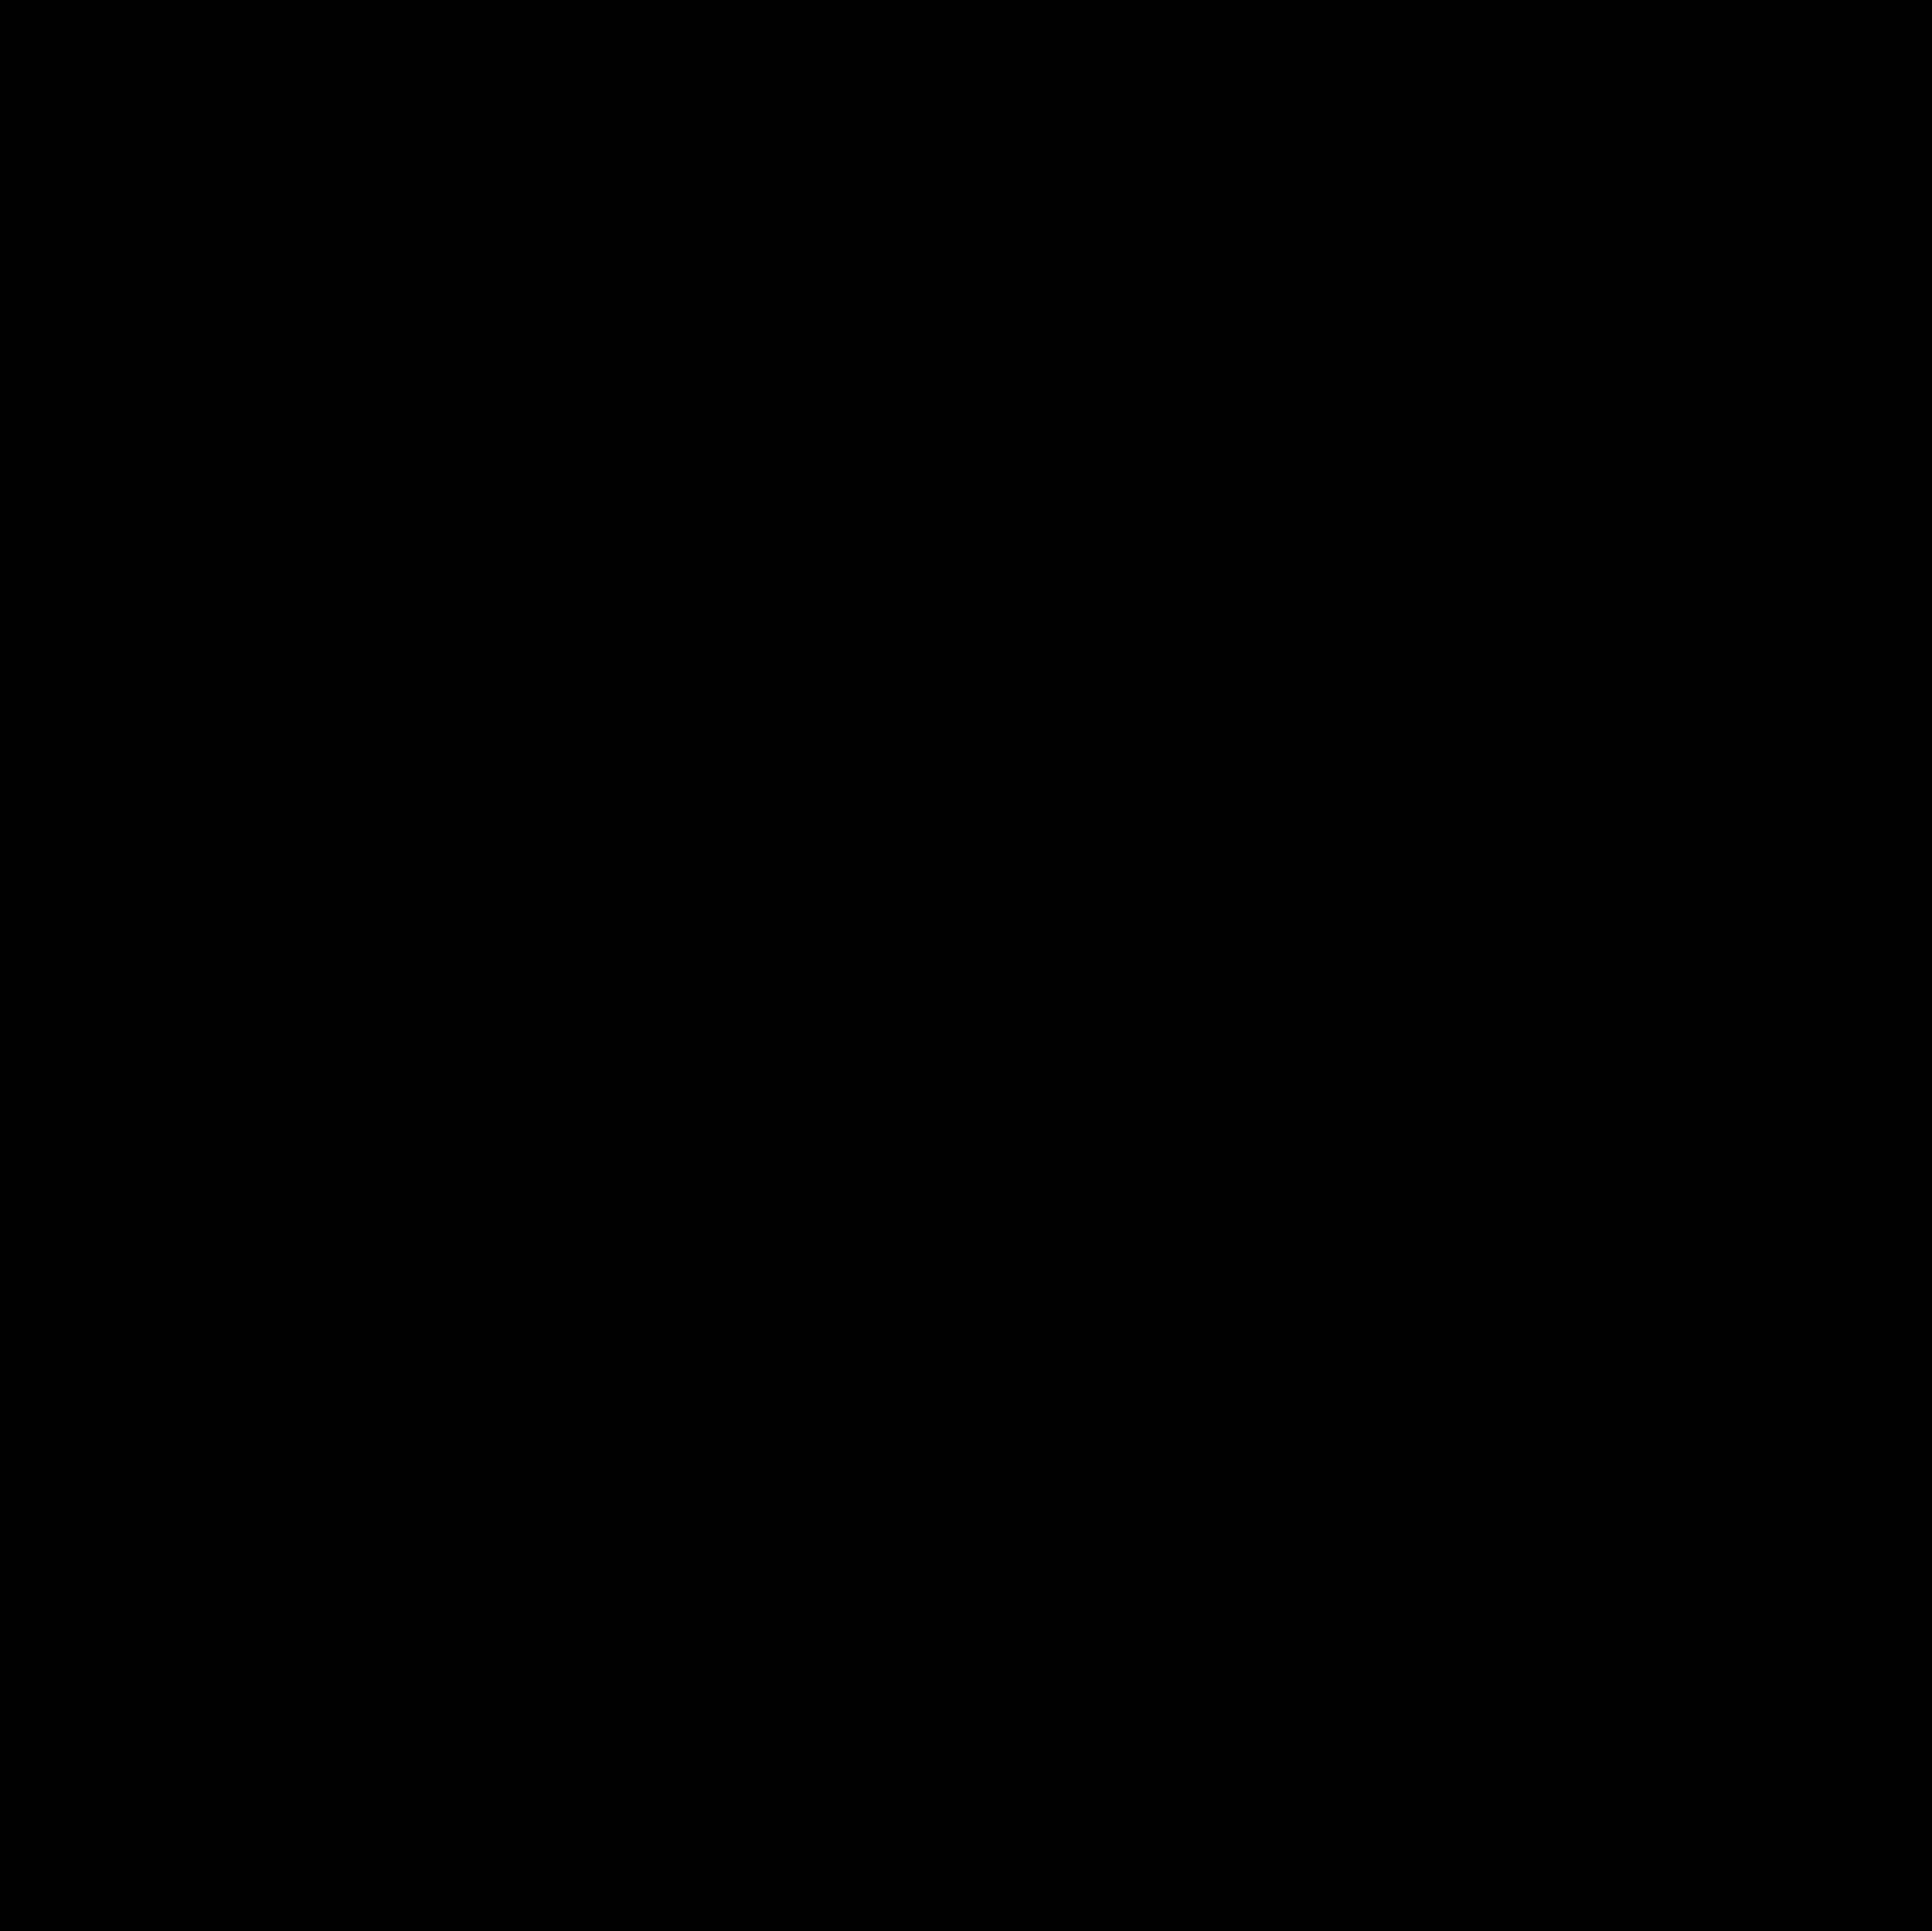 img_6110